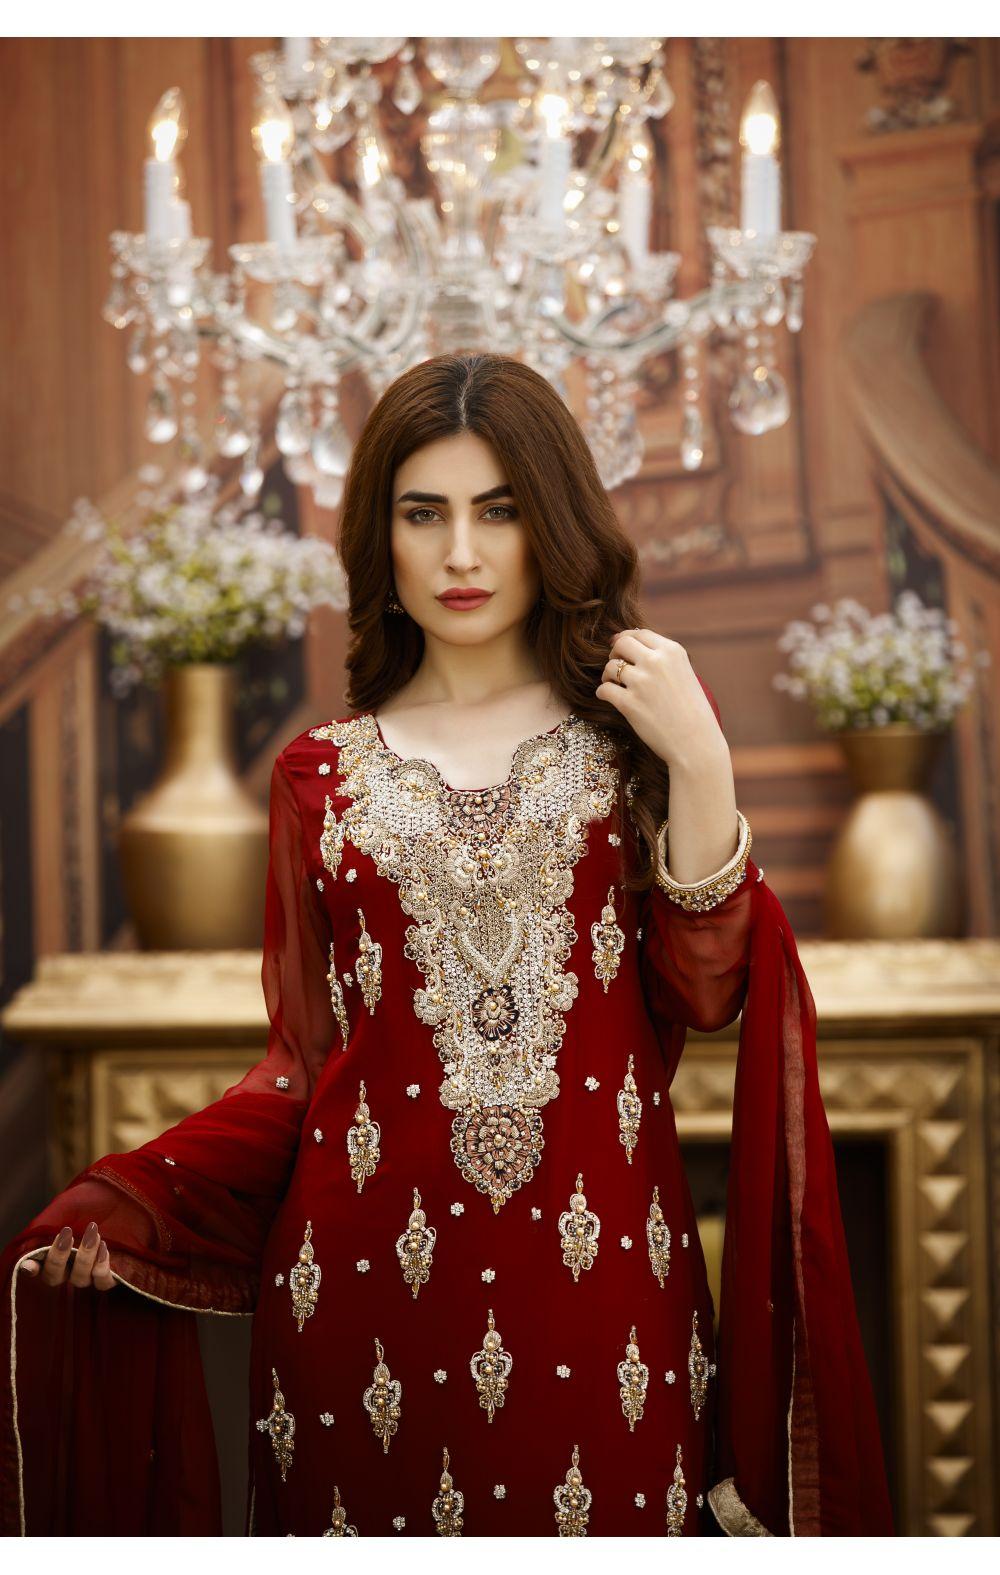 Buy Exclusive Maroon And Golden Bridal Wear – G16229 Online In USA, Uk & Pakistan - 02